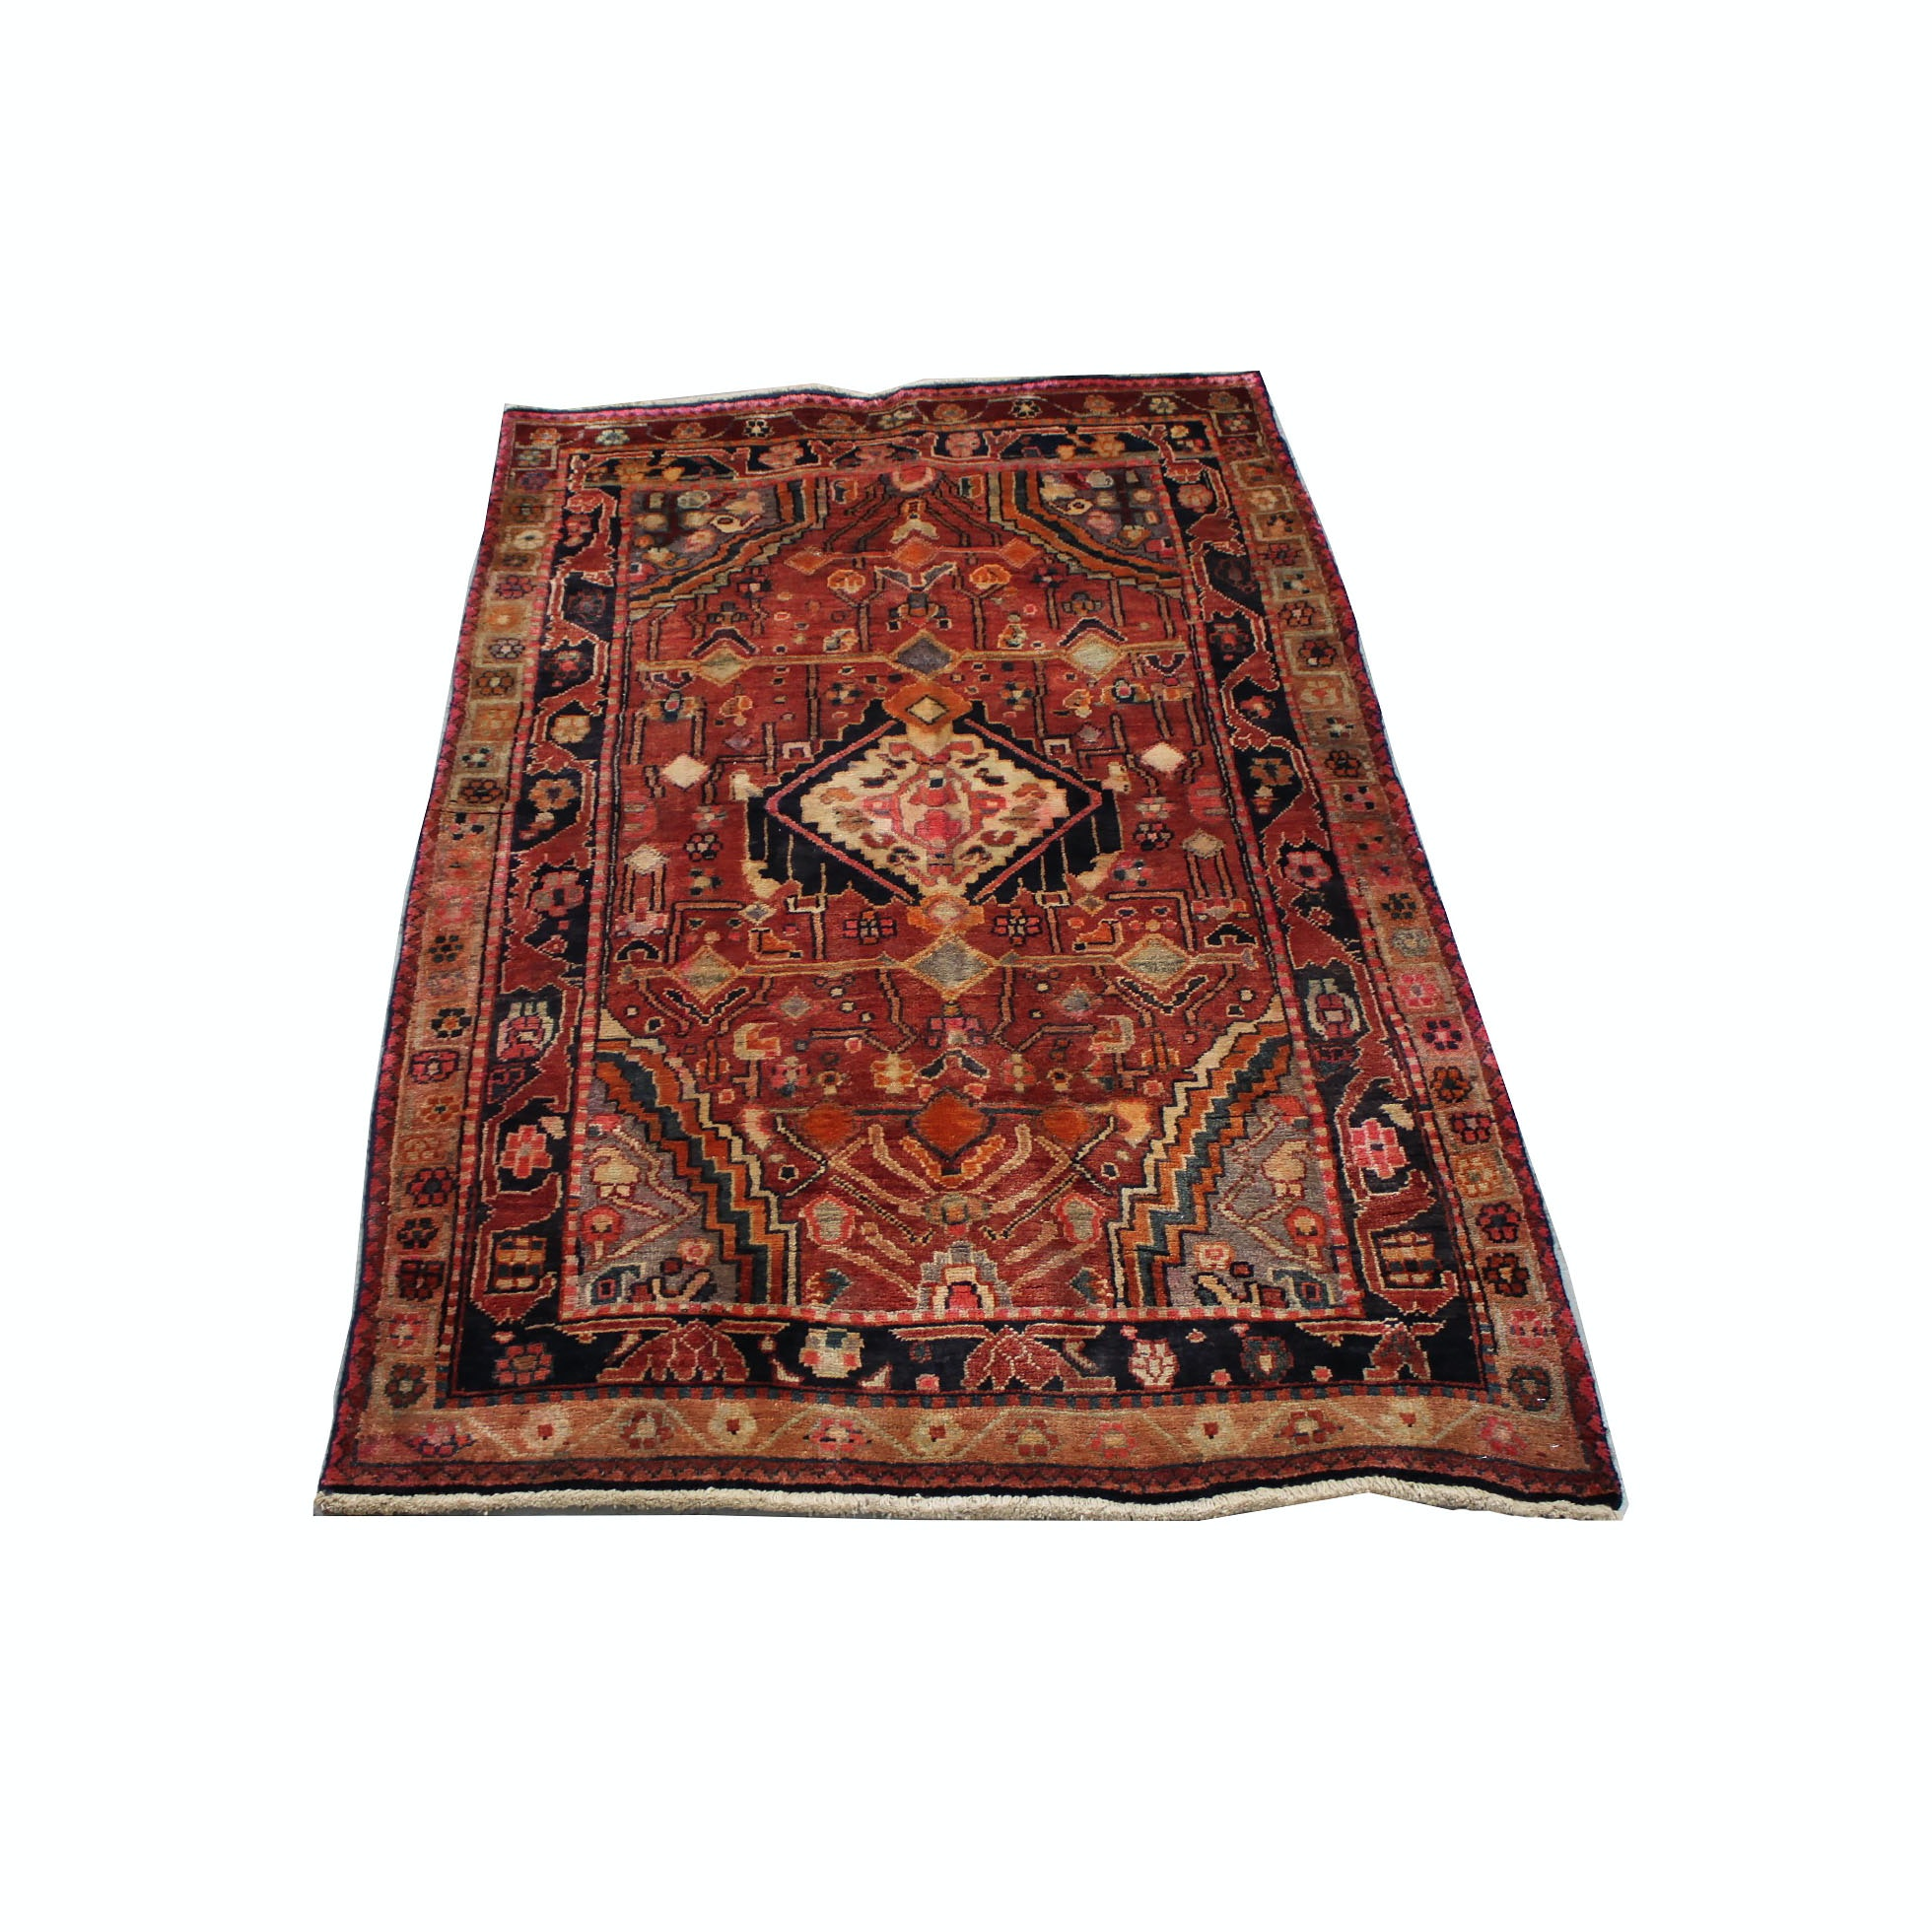 Vintage Hand-Knotted Persian Viss Heriz Wool Area Rug